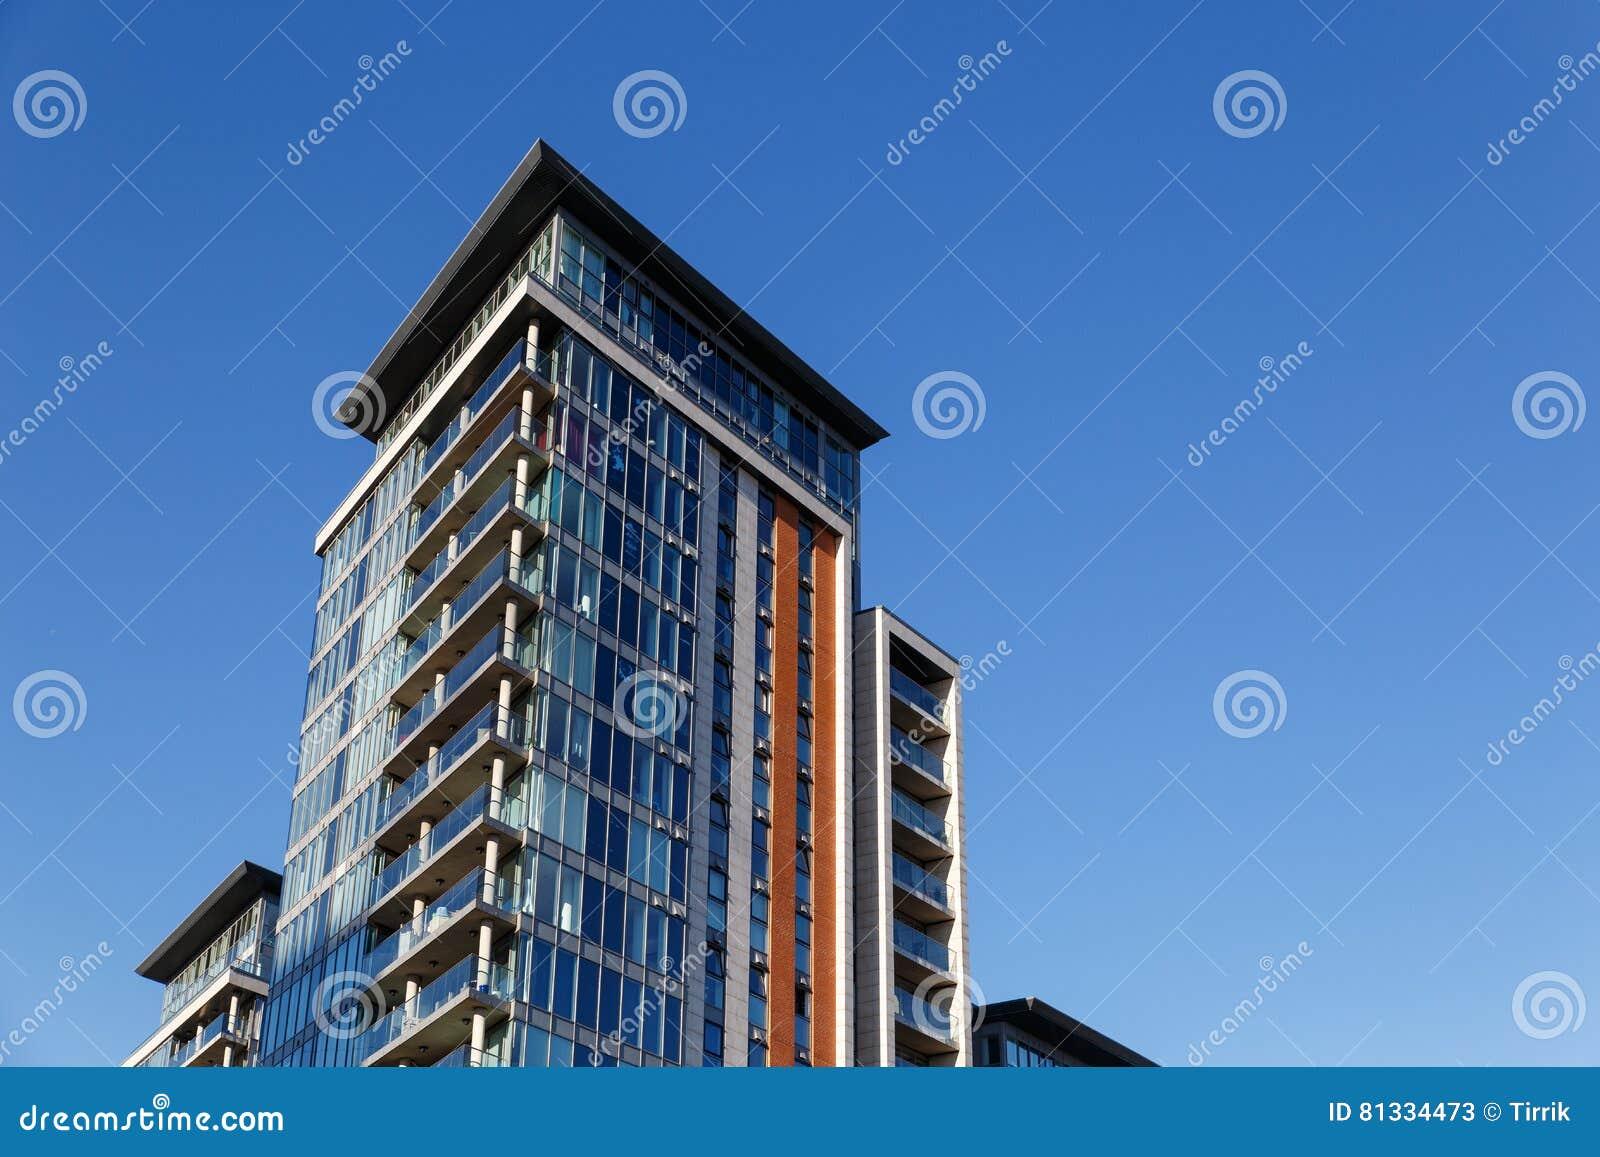 Edificio de oficinas moderno con la fachada de cristal - Fachada de cristal ...